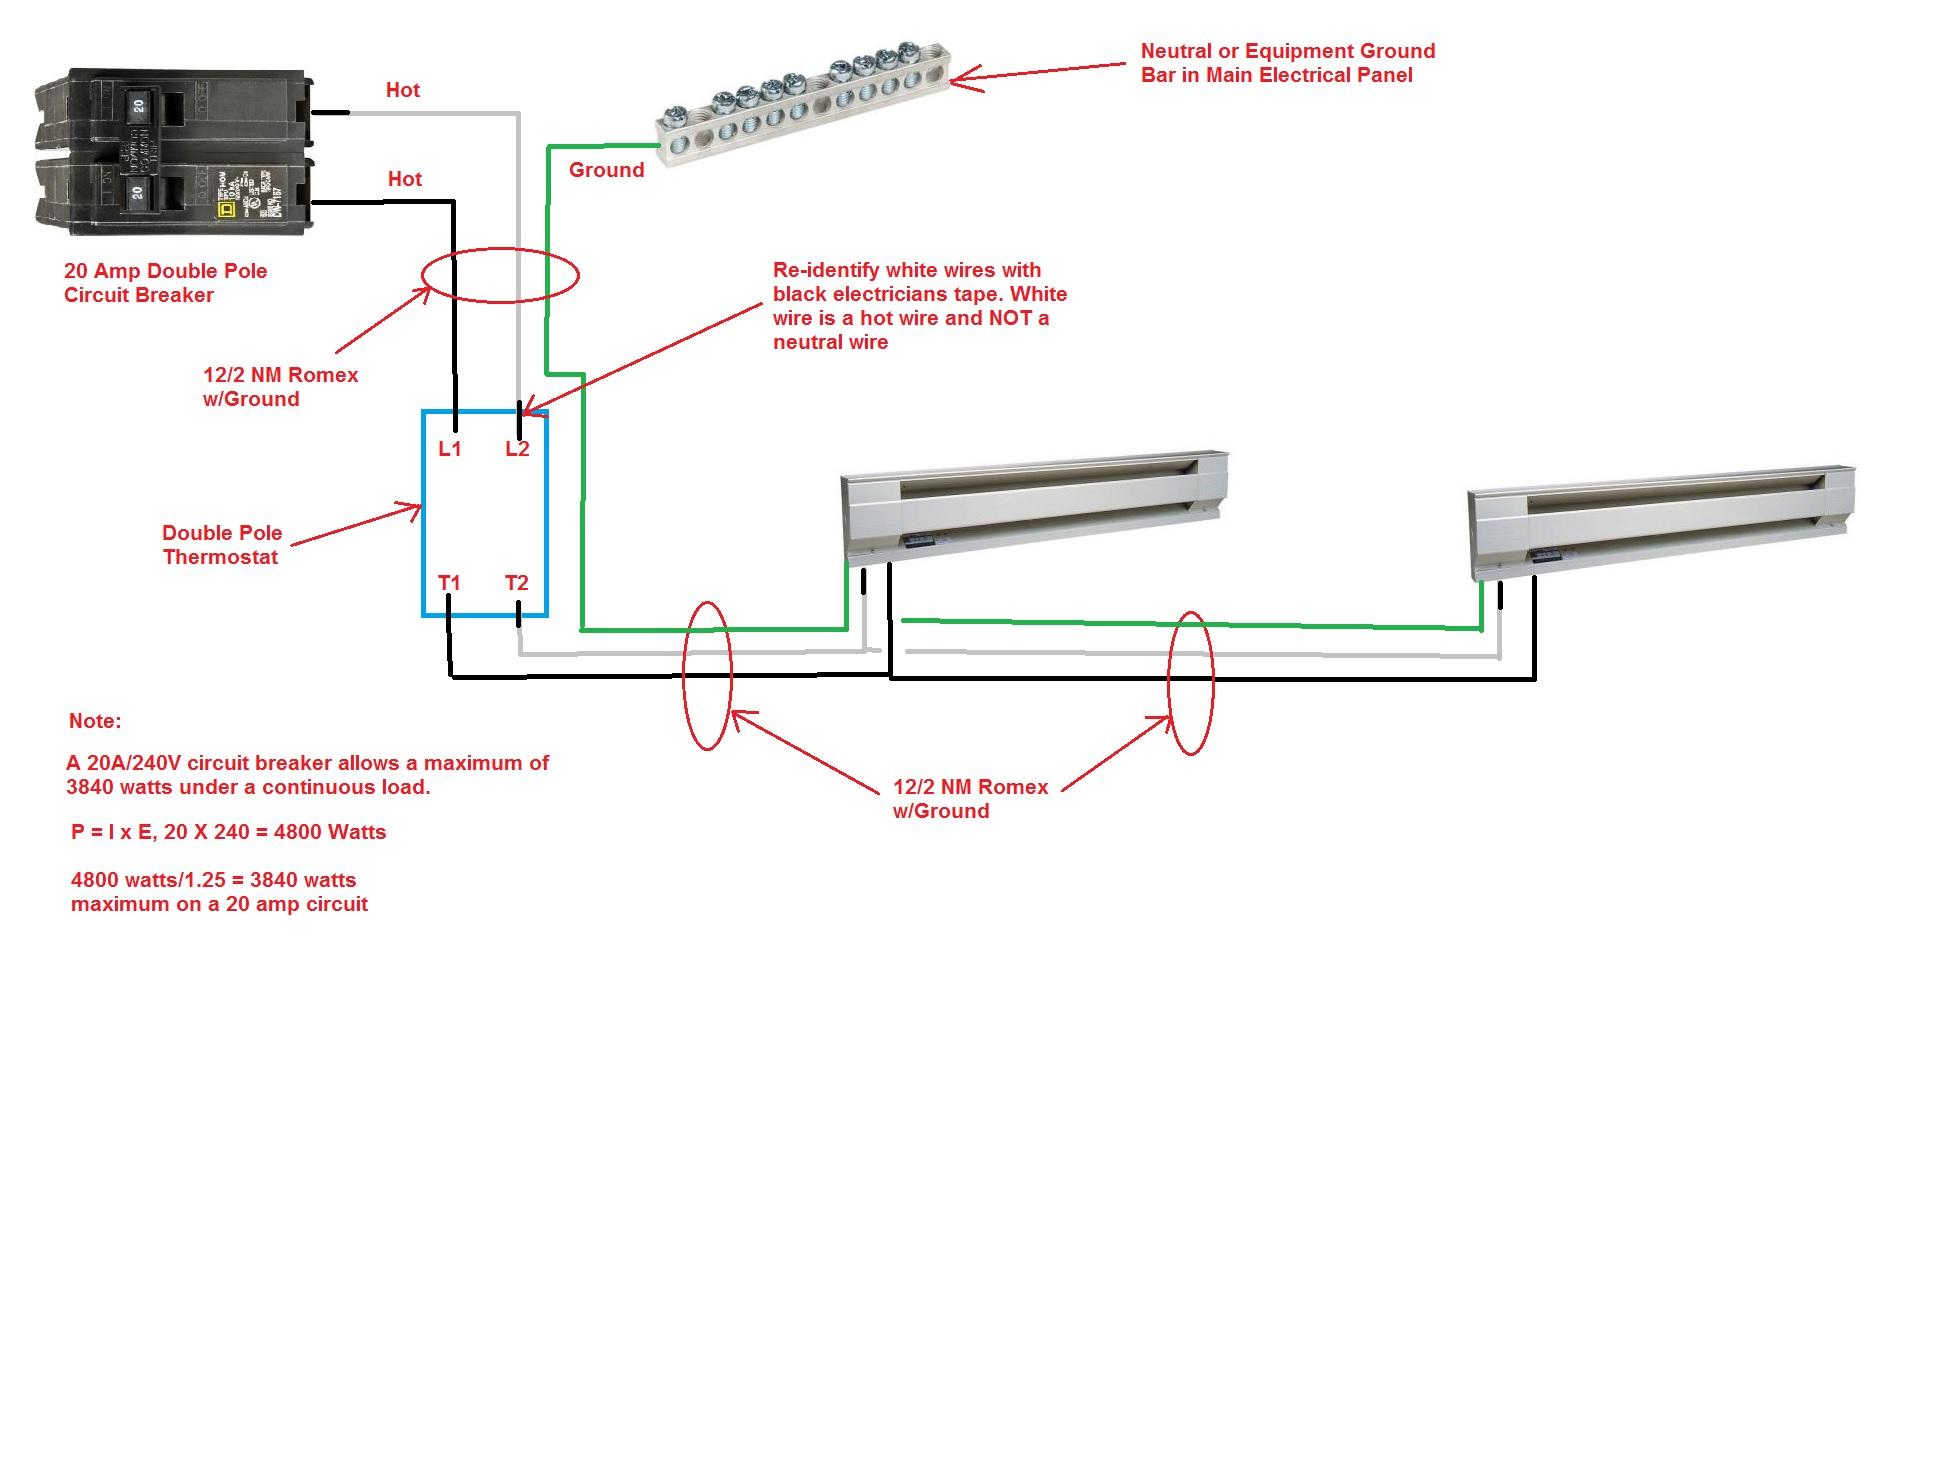 frenheit electric baseboard wiring diagram wiring diagram third level fahrenheit electric baseboard wiring diagram wiring diagram todays electric baseboard installation fahrenheit baseboard heaters 110 volt